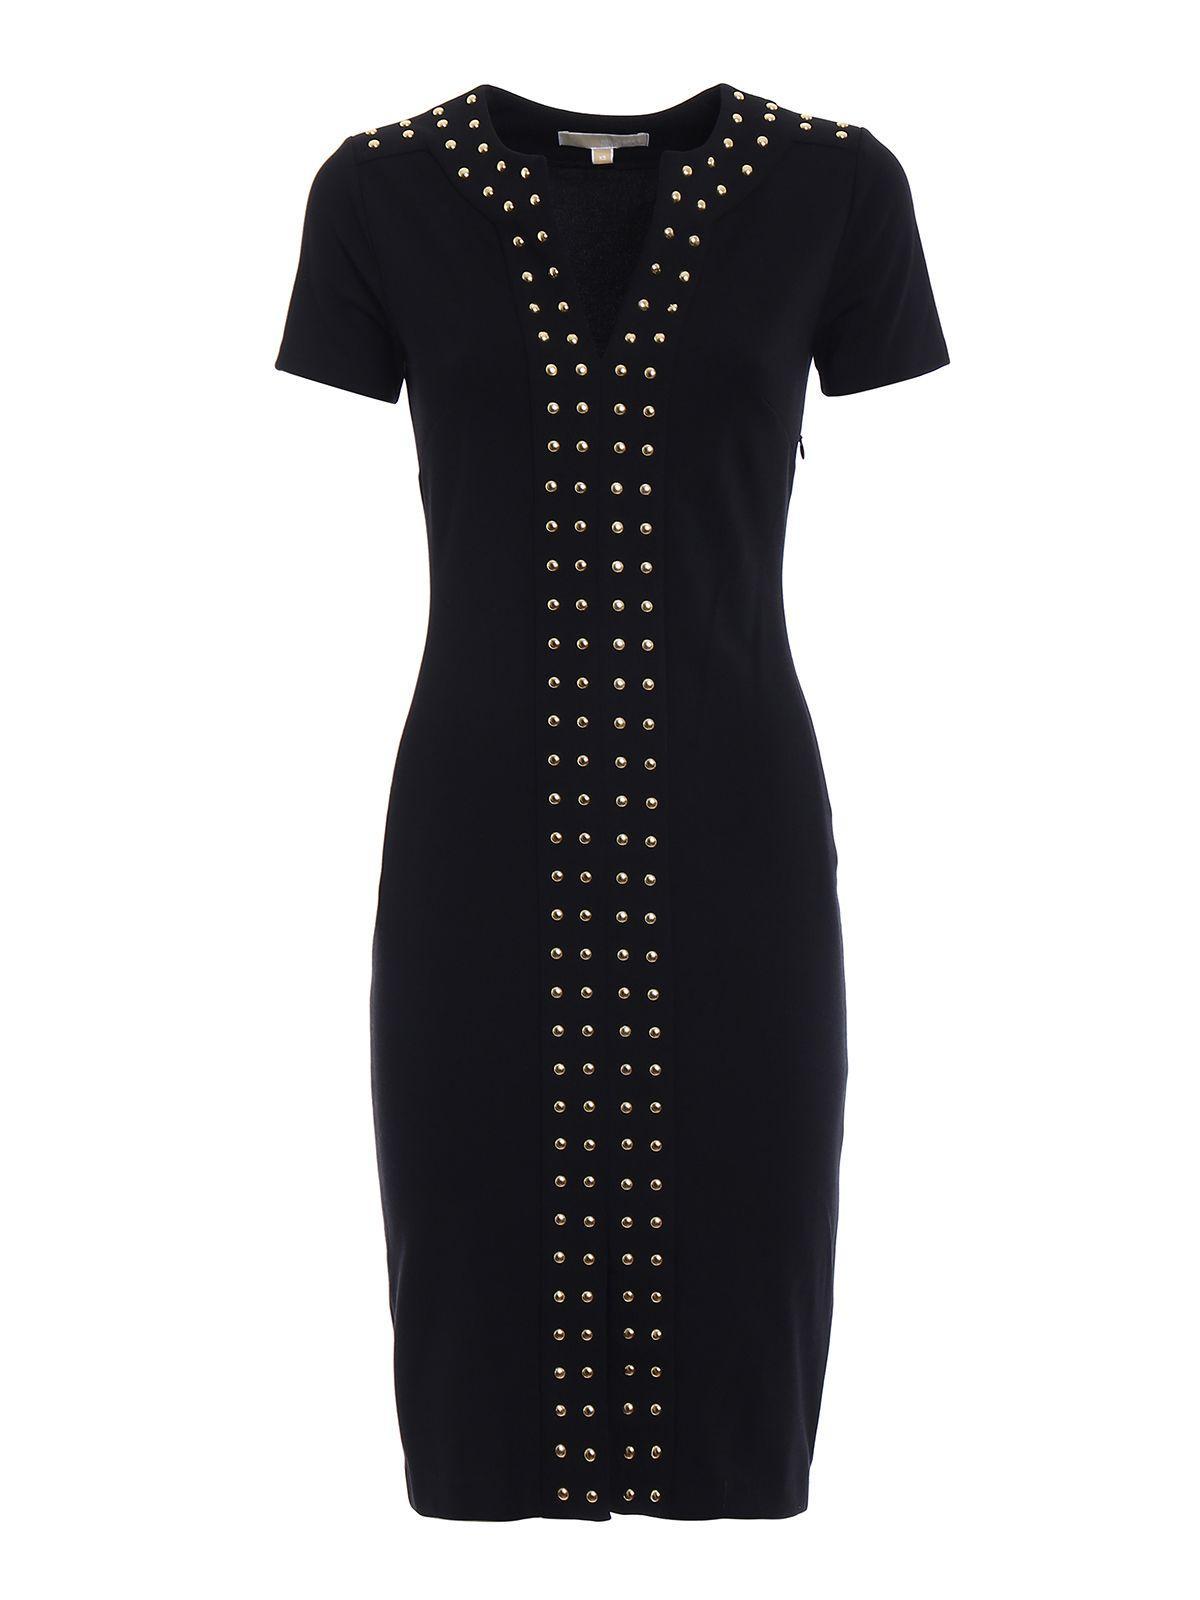 Michael Kors Stud Detail Jersey Pencil Dress In Black